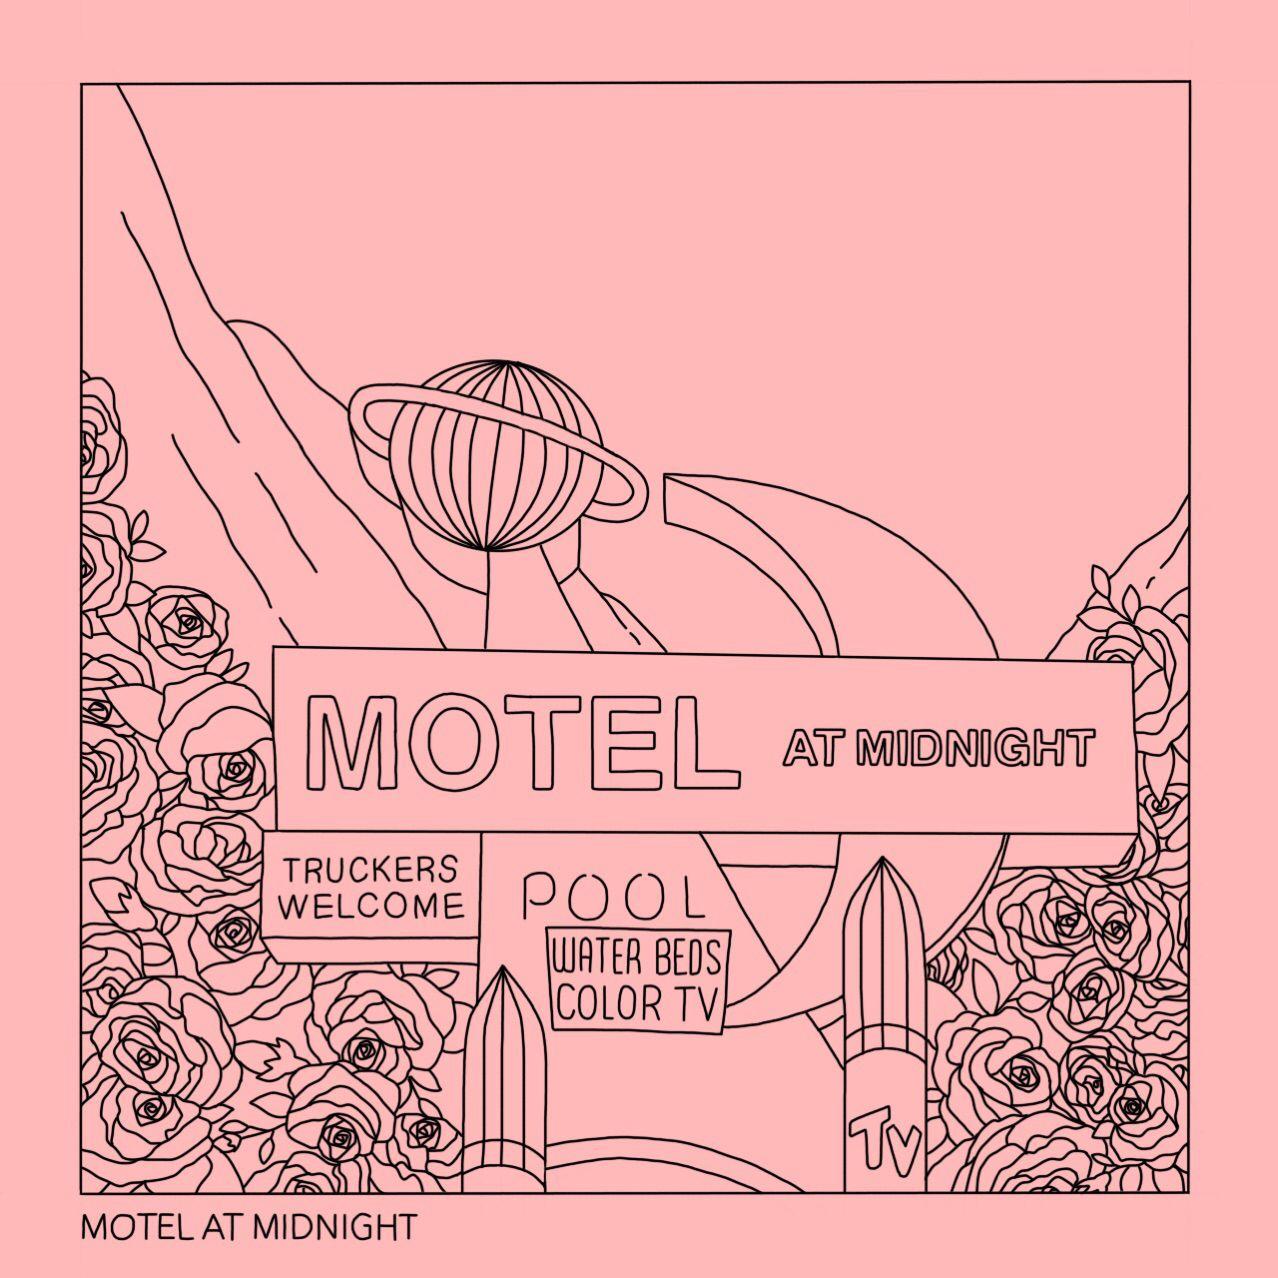 Motel At Midnight Aesthetic Art Prints Simple Line Drawing Etsy Simple Line Drawings Aesthetic Drawing Aesthetic Art